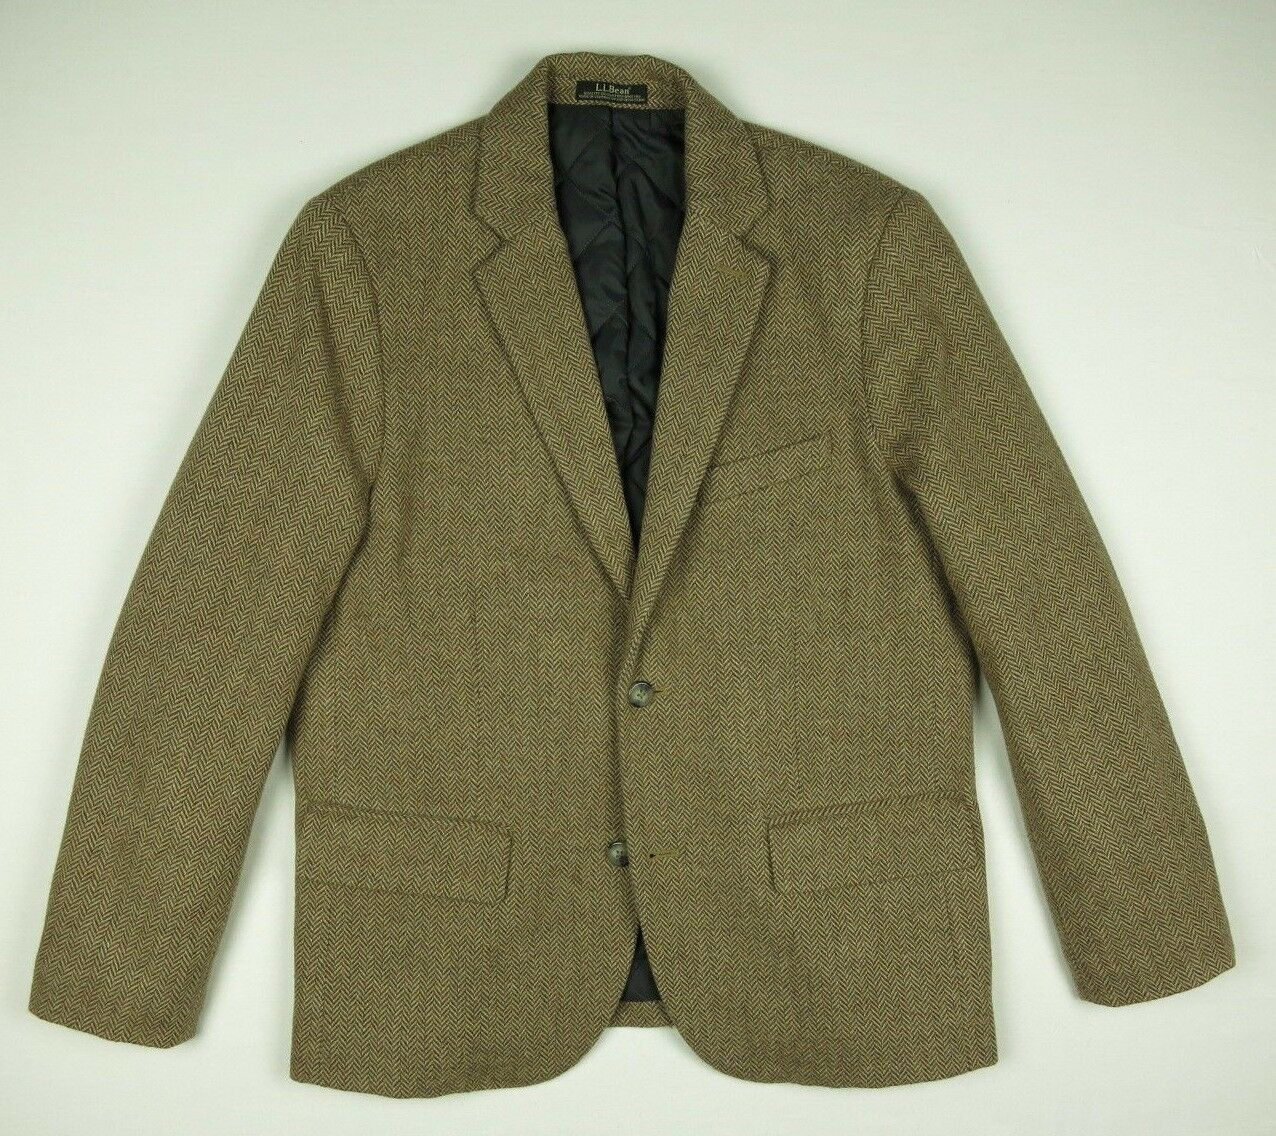 L.L. Bean Primaloft Insulated Herringbone Tweed Winter Sport Coat Men's 40S